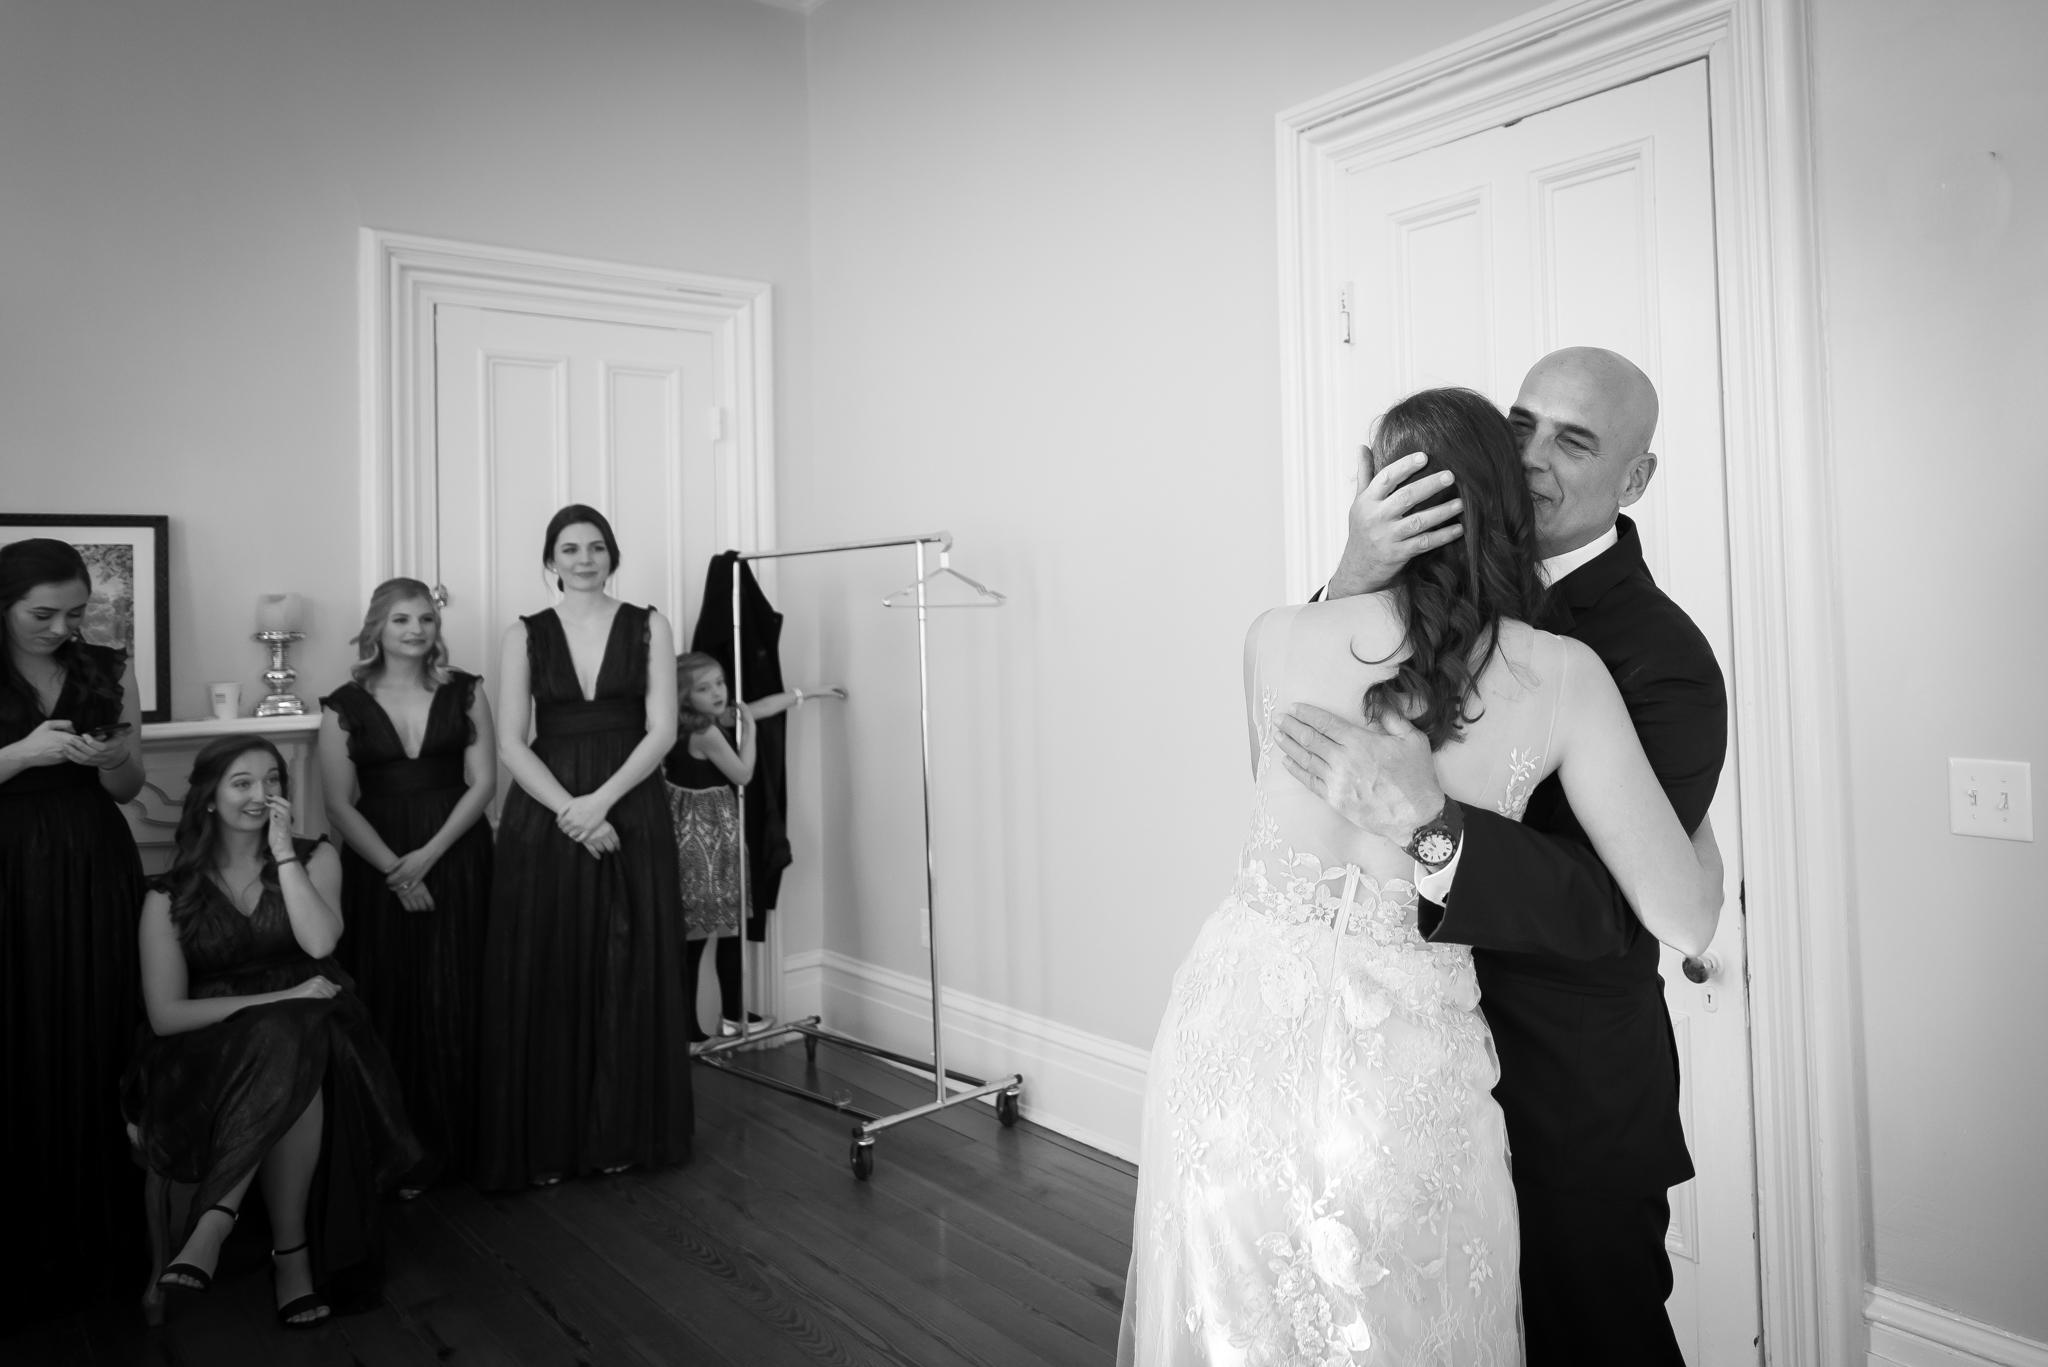 merrimon-wynne-wedding-photography-009.jpg